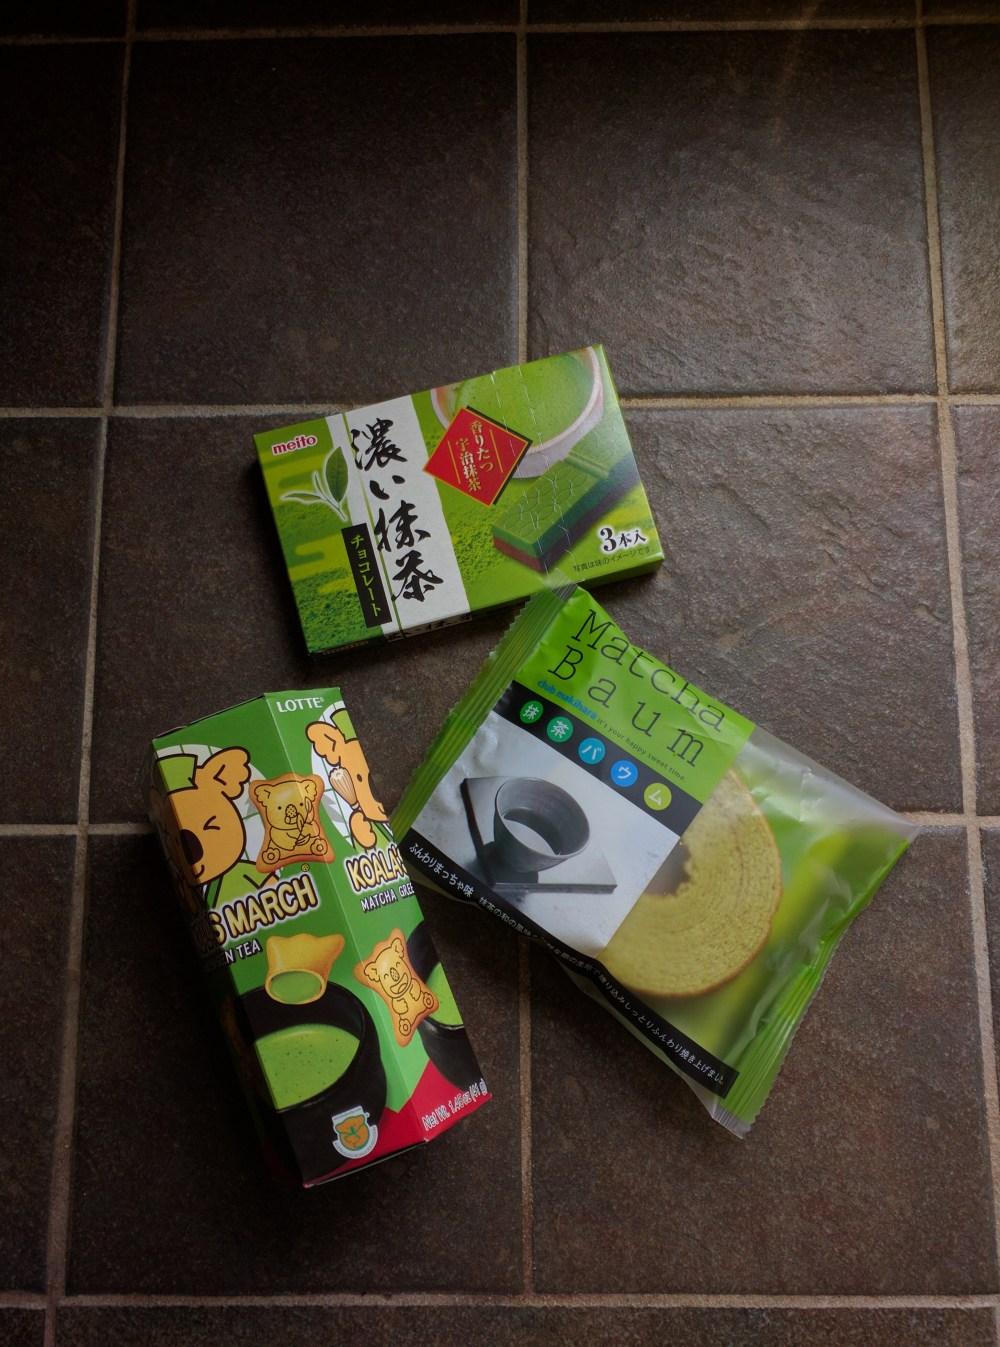 matcha green tea candy from mitswua